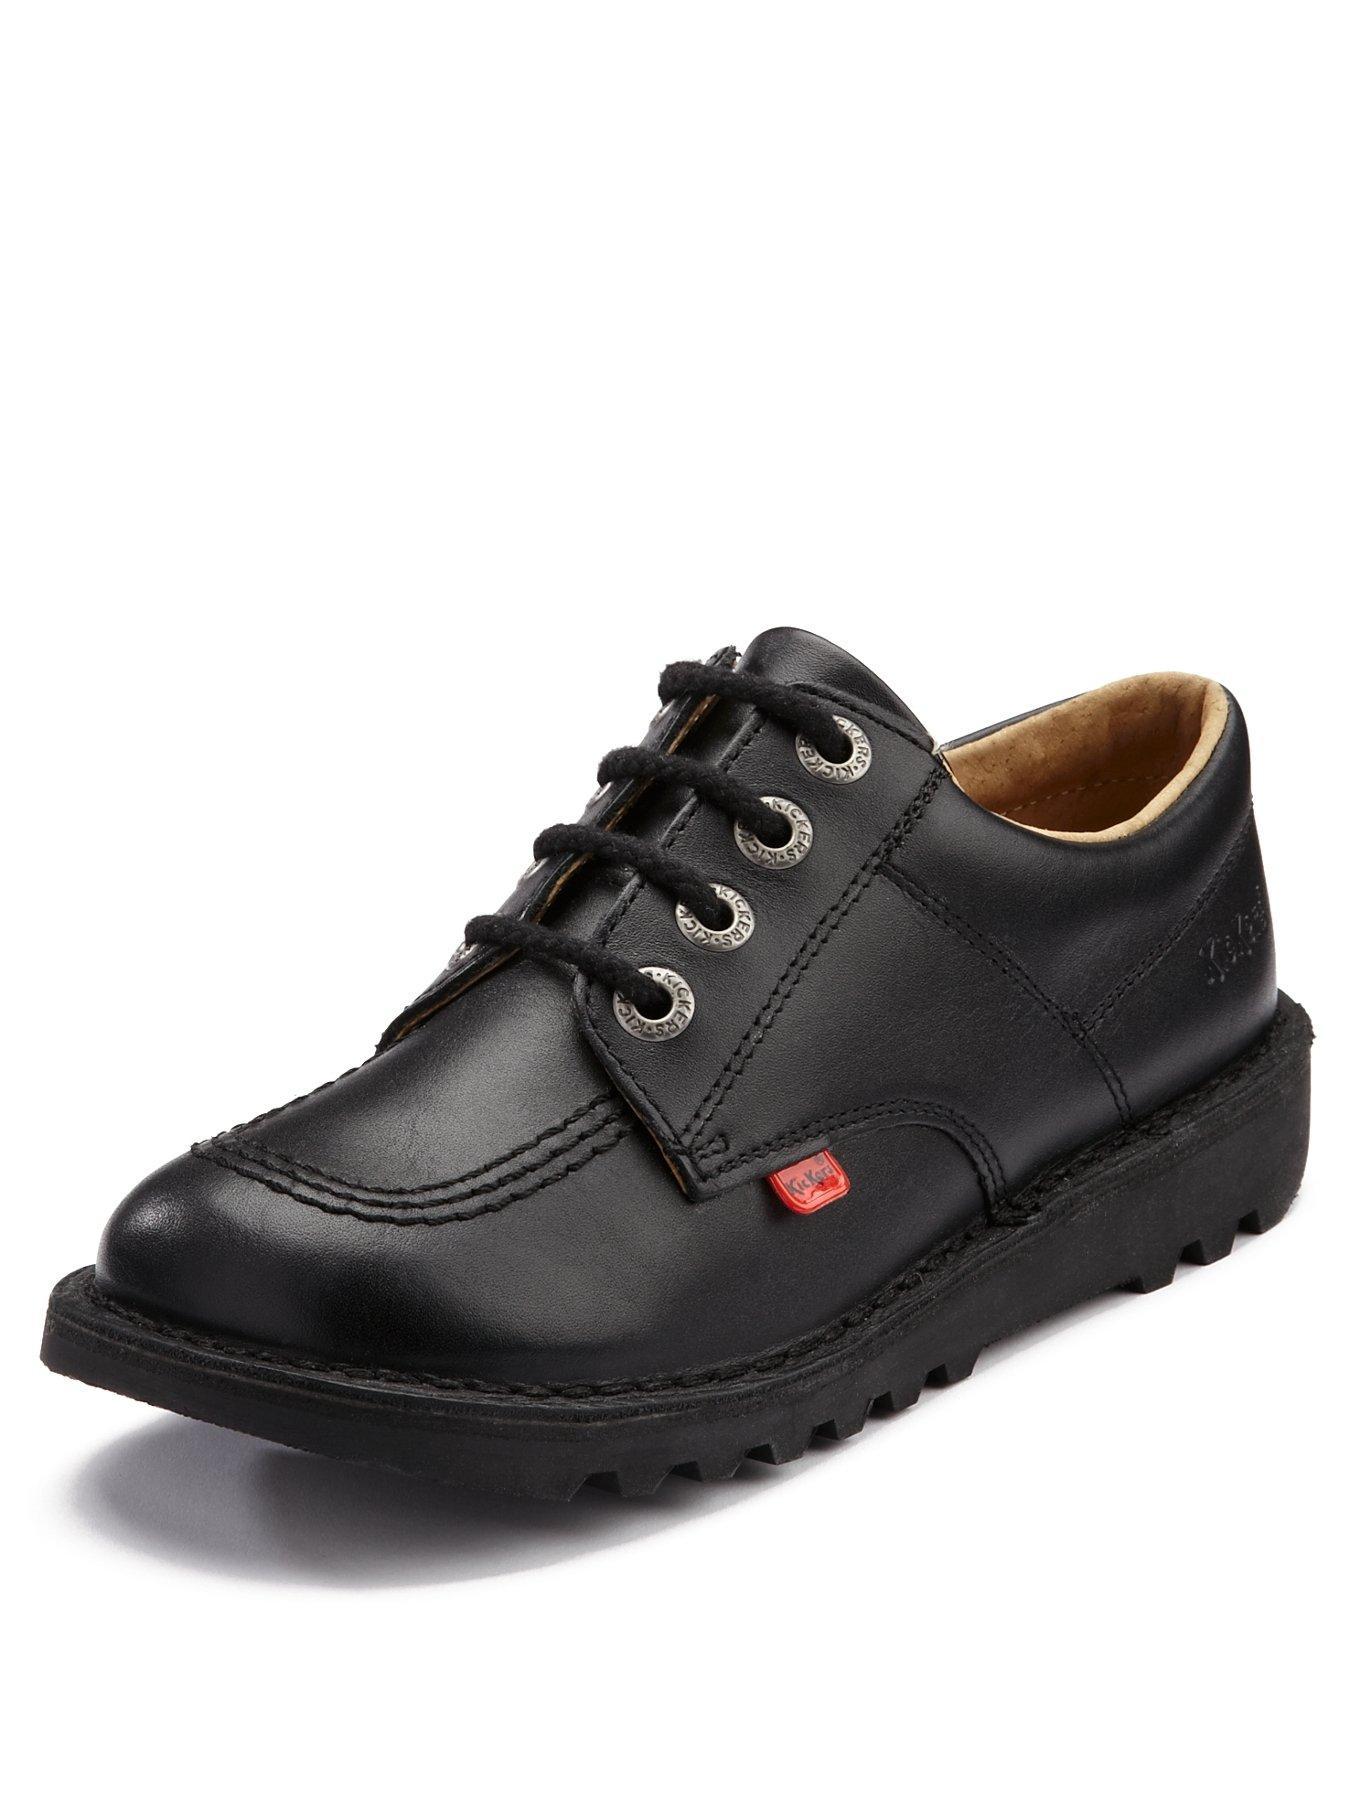 Up Core Kickers co Kick Shoes Lace Leather Lo School uk BlackVery QtrdshCx